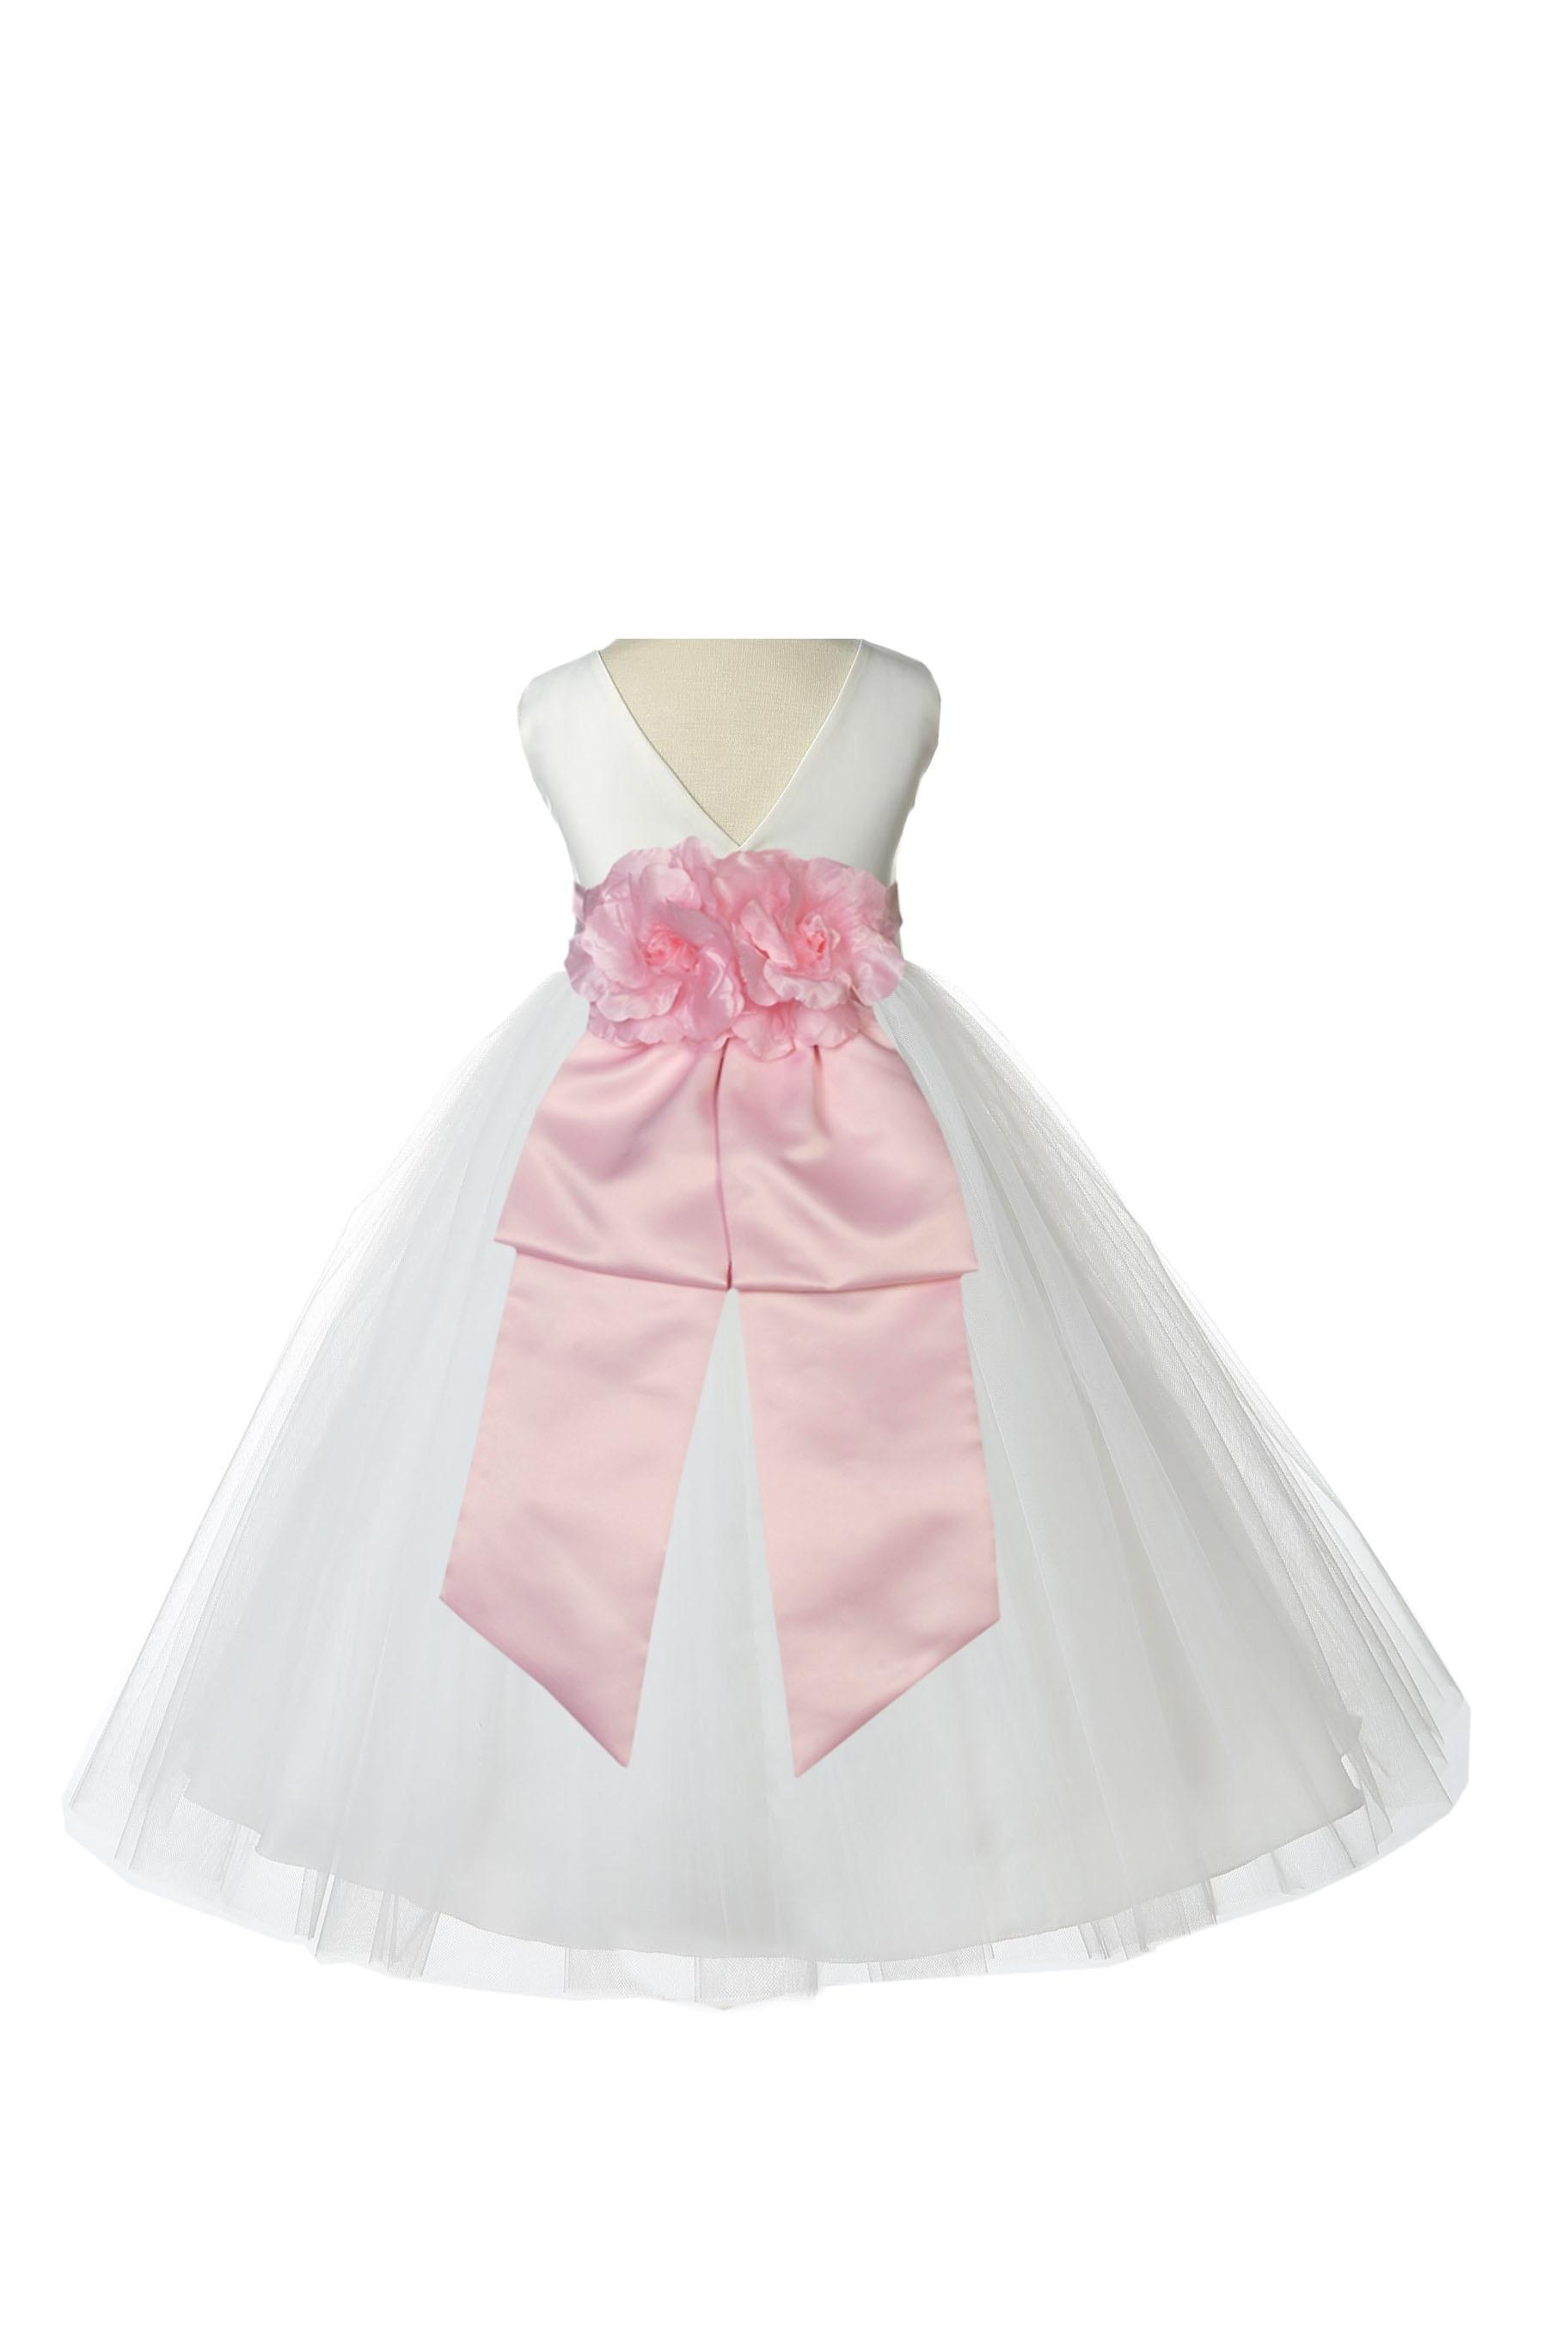 Ekidsbridal V-Shaped Back Neckline Ivory Flower Girl Dress Tulle Junior Bridesmaid Wedding Pageant Toddler Recital Easter Holiday Communion Baptism Formal Occasions 108a